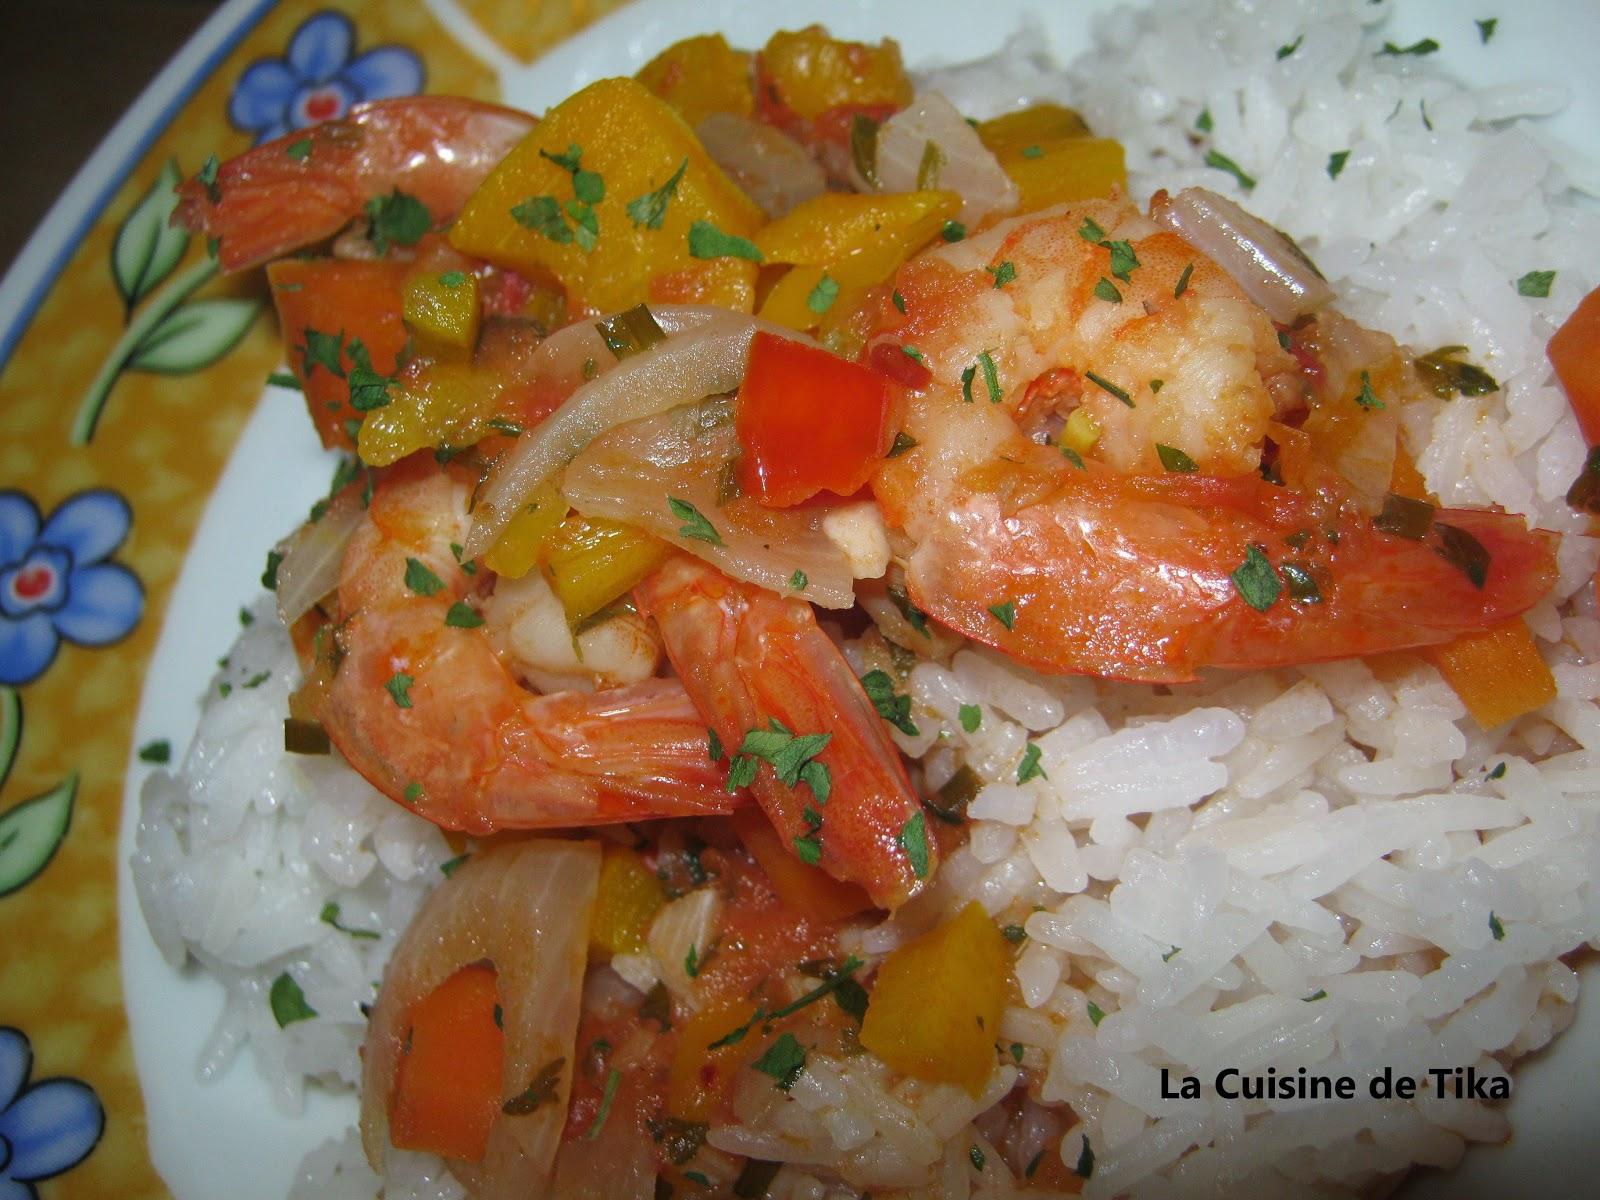 La cuisine de tika crevettes cardinales for Au feminin cuisine